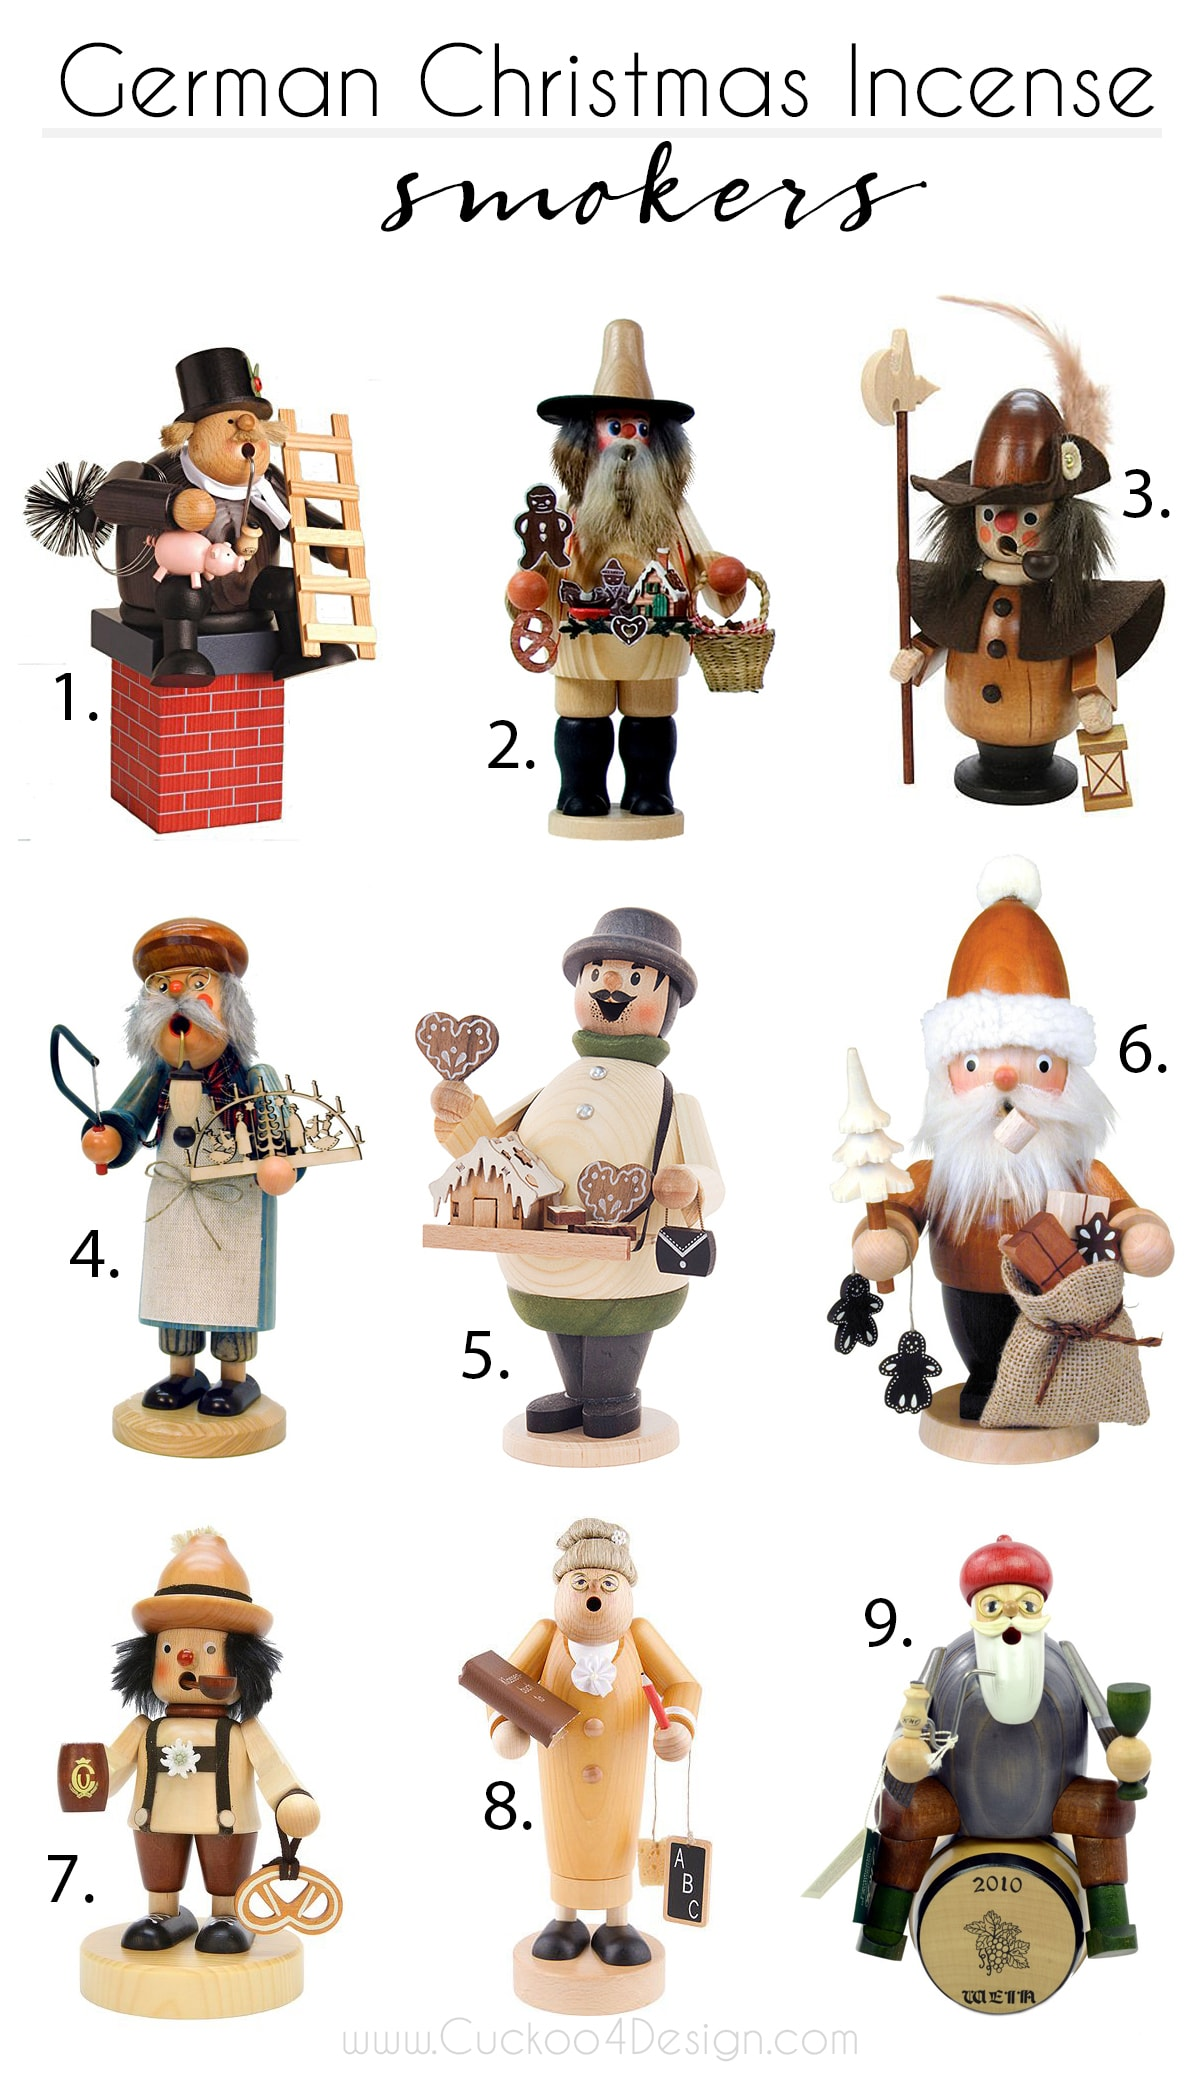 my favorite wooden German incense smokers